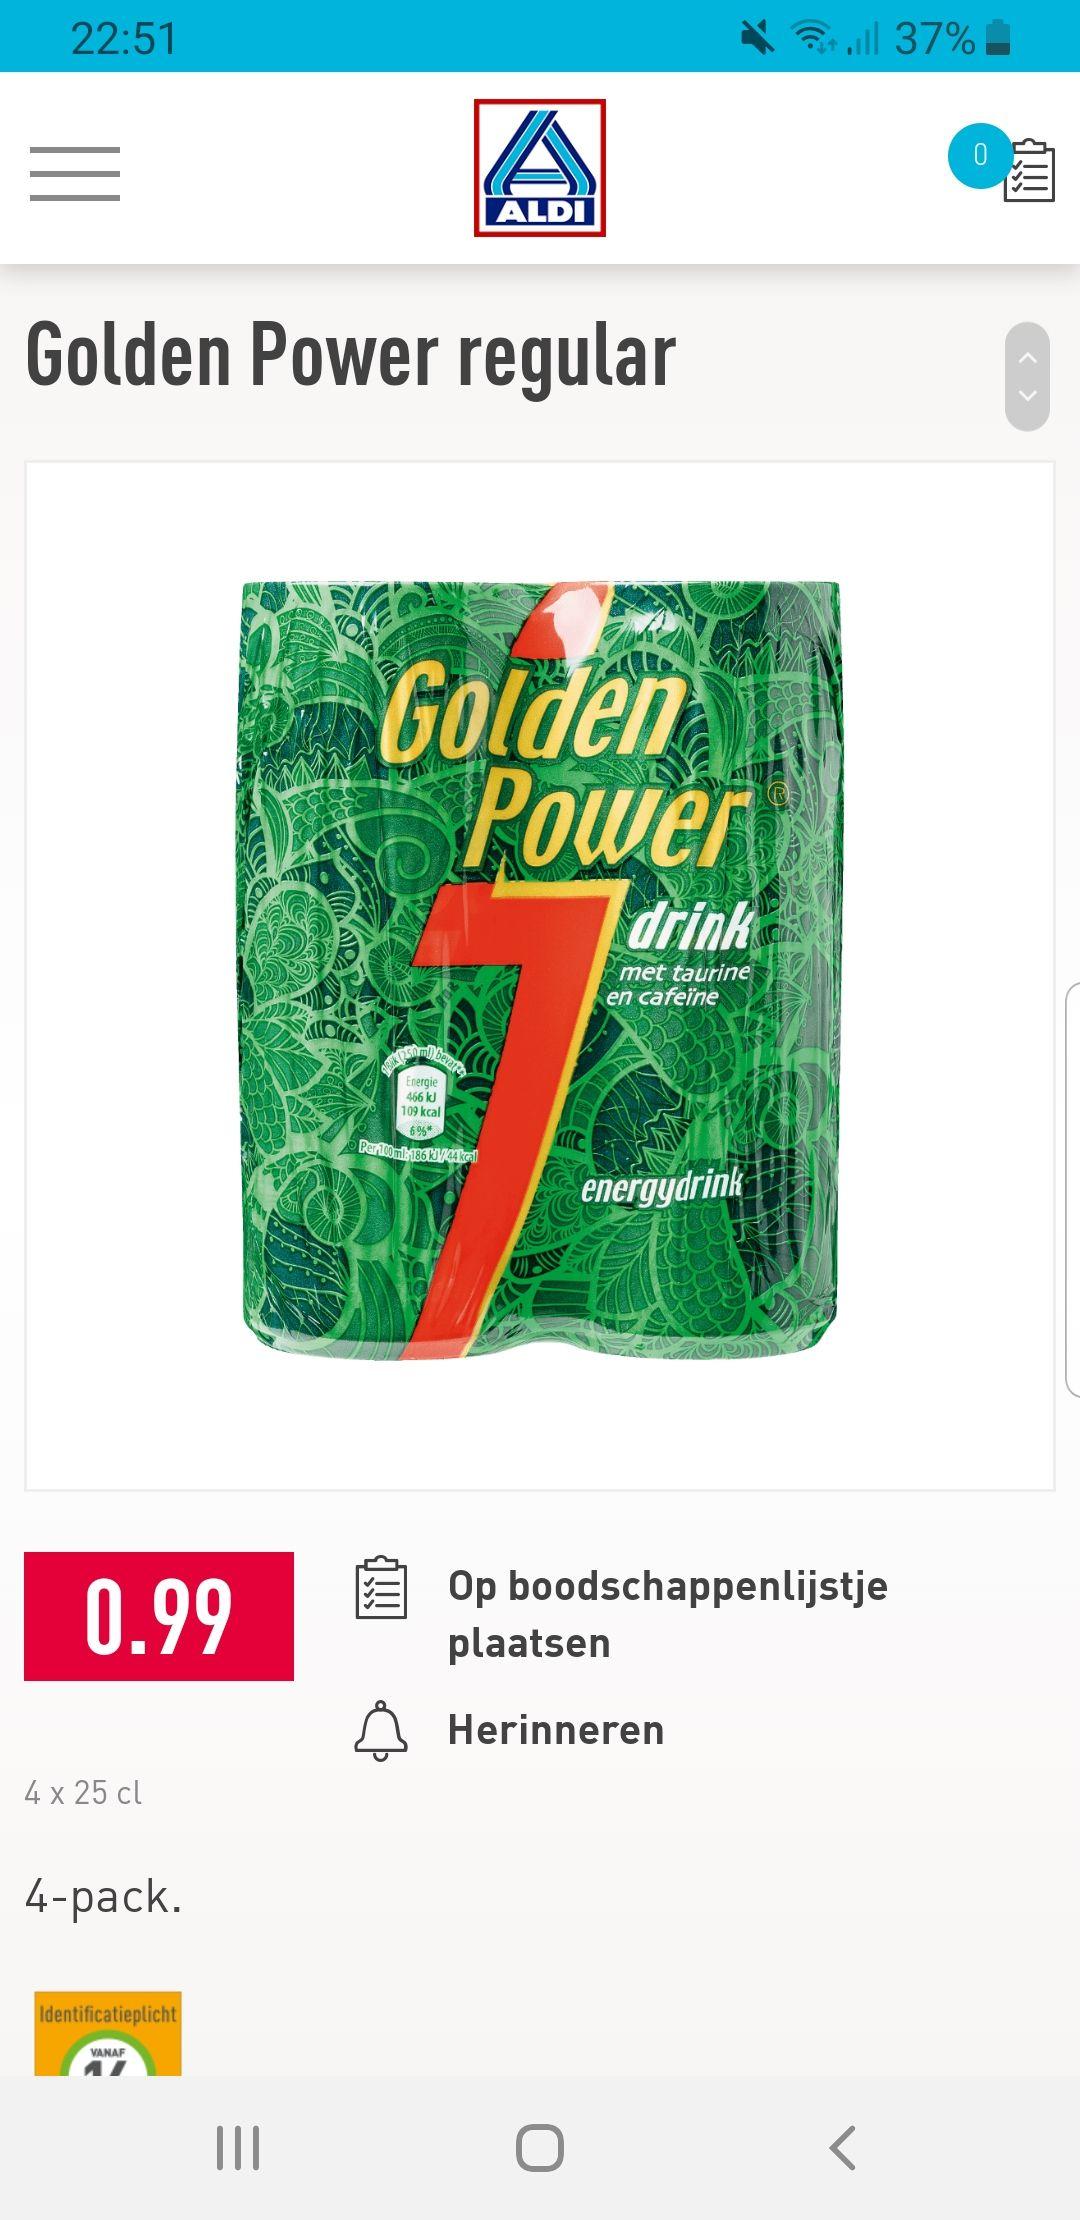 4 blikjes golden power voor 99 cent (= ruim 41% korting)